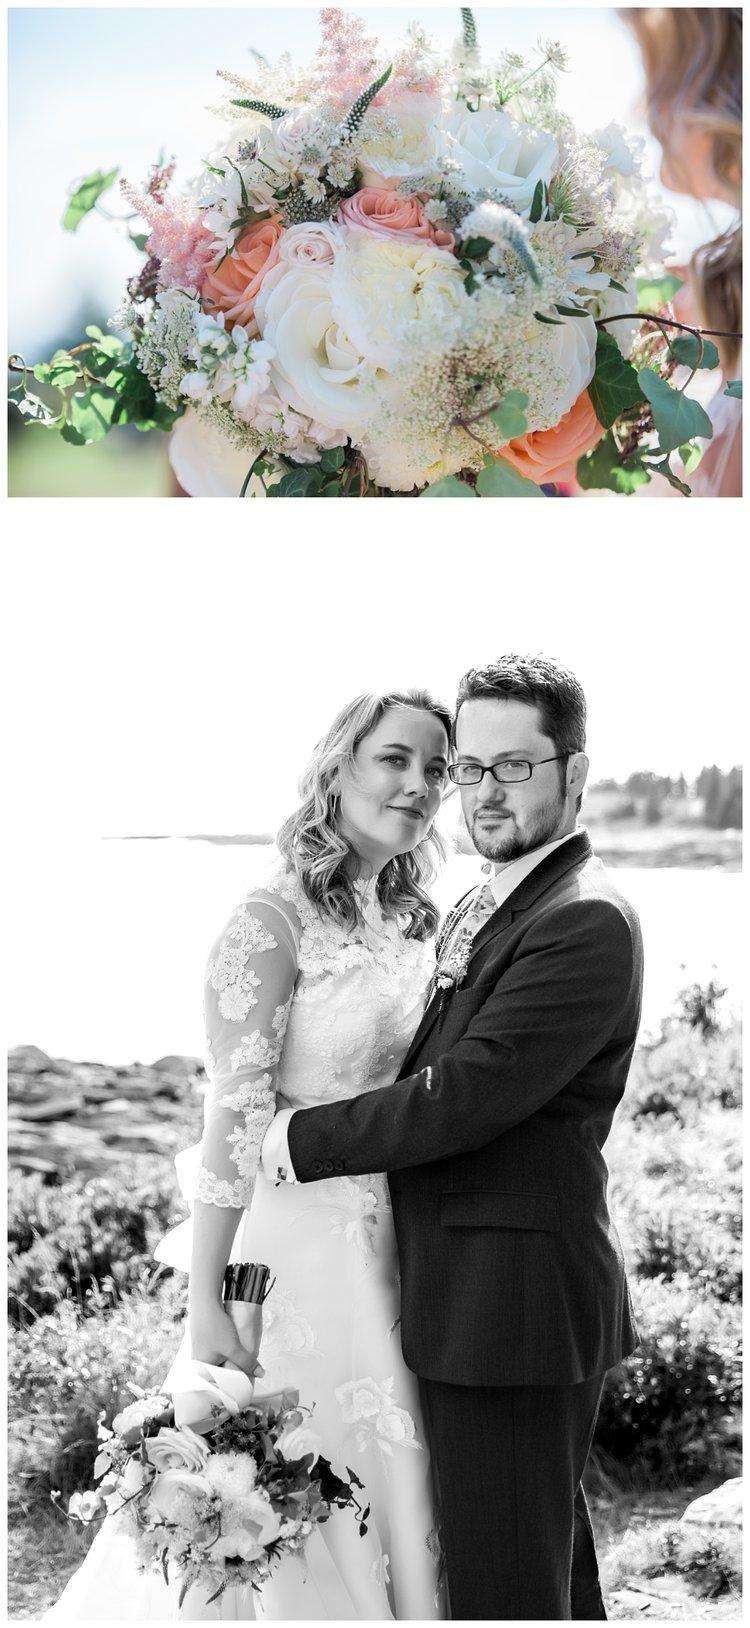 Maine Wedding Photographer — Windy Hill Photography